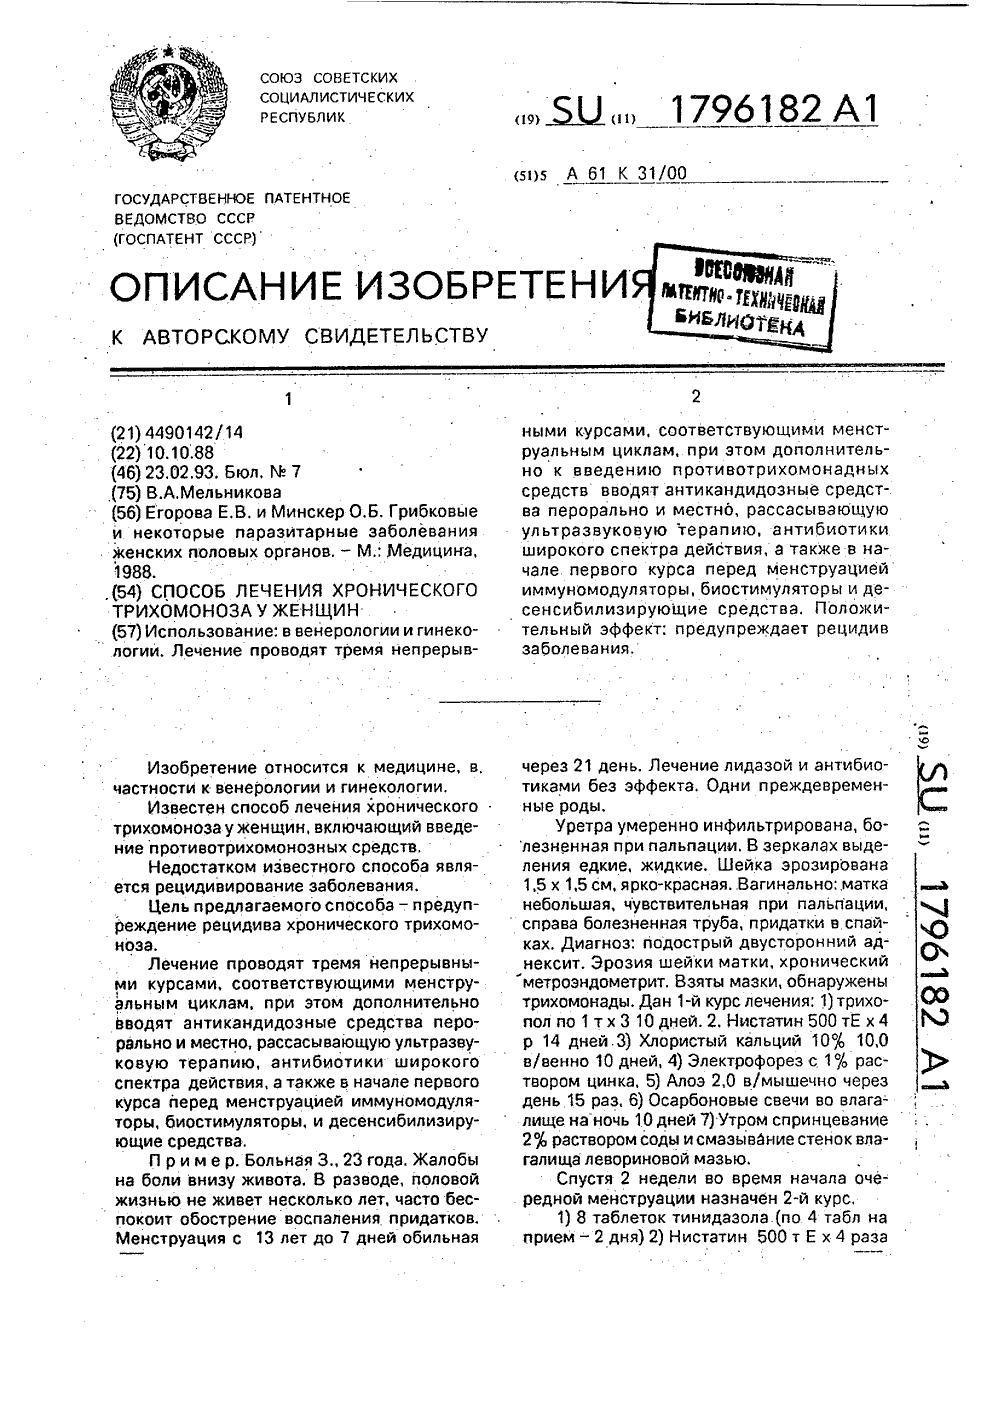 Схема лечения хронич трихомоноза фото 37